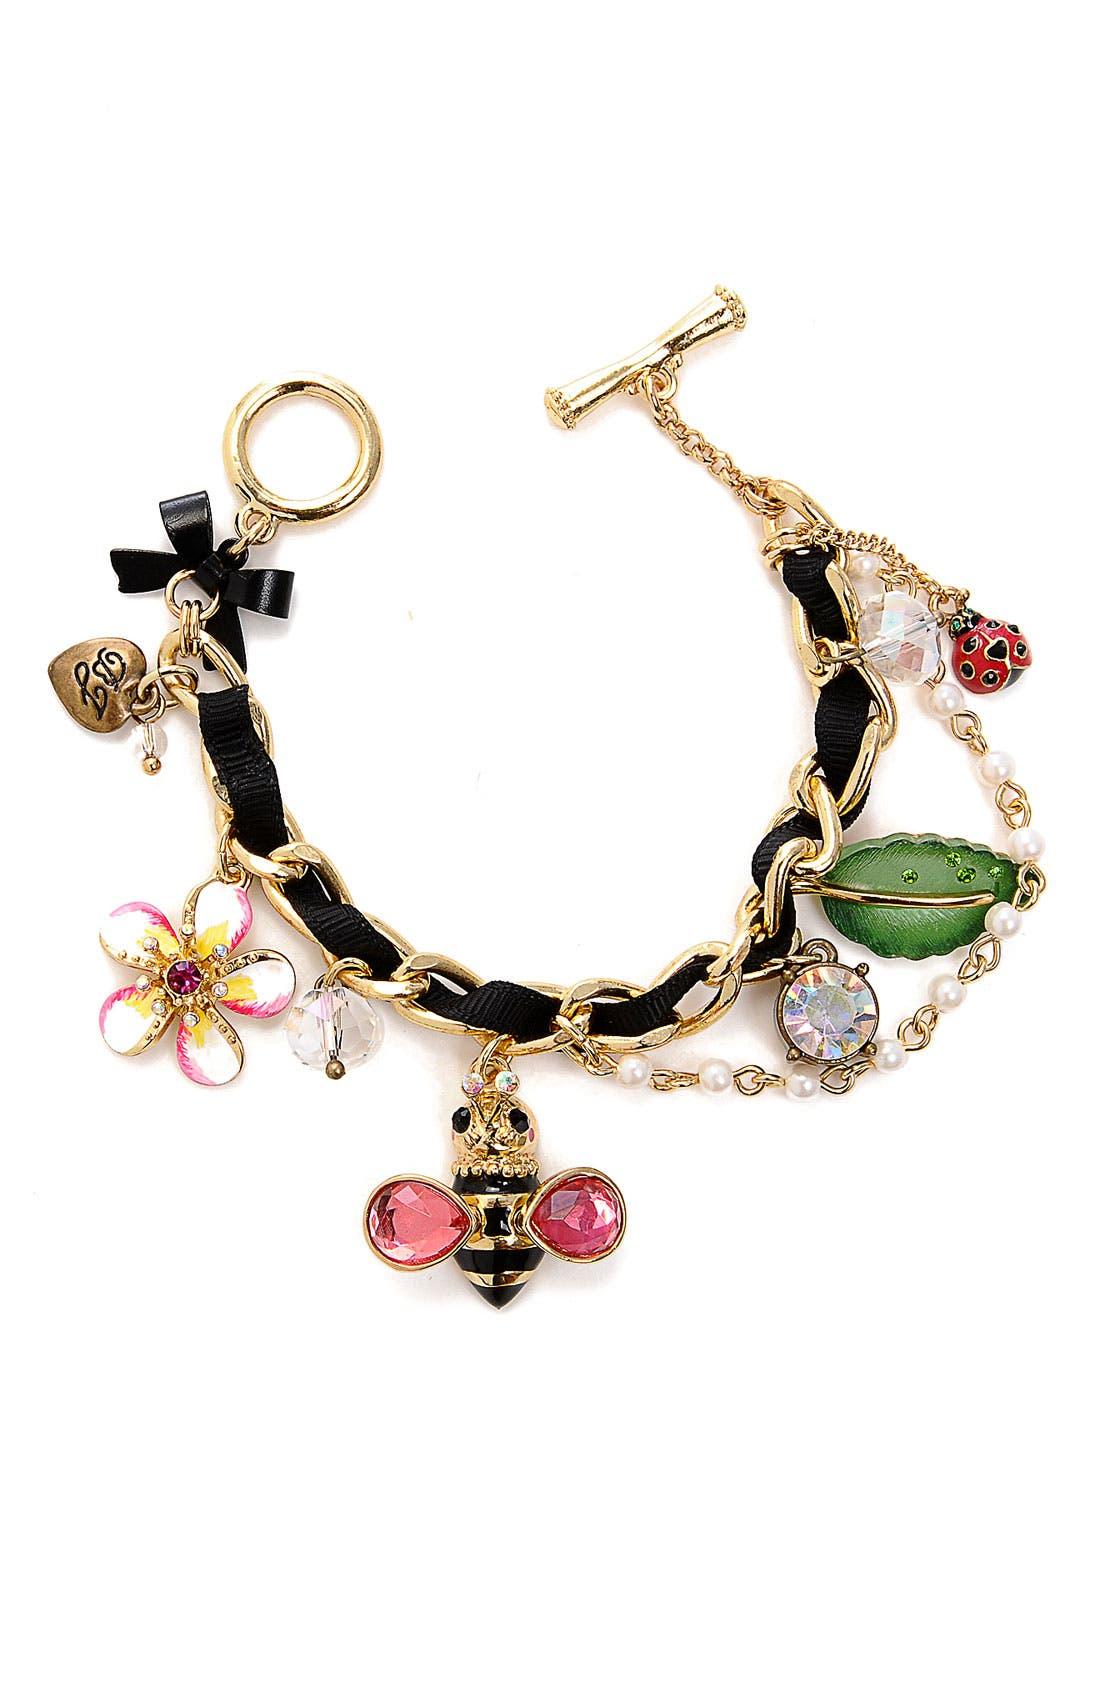 Main Image - Betsey Johnson 'Hawaiian Luau' Bumblebee Charm Bracelet